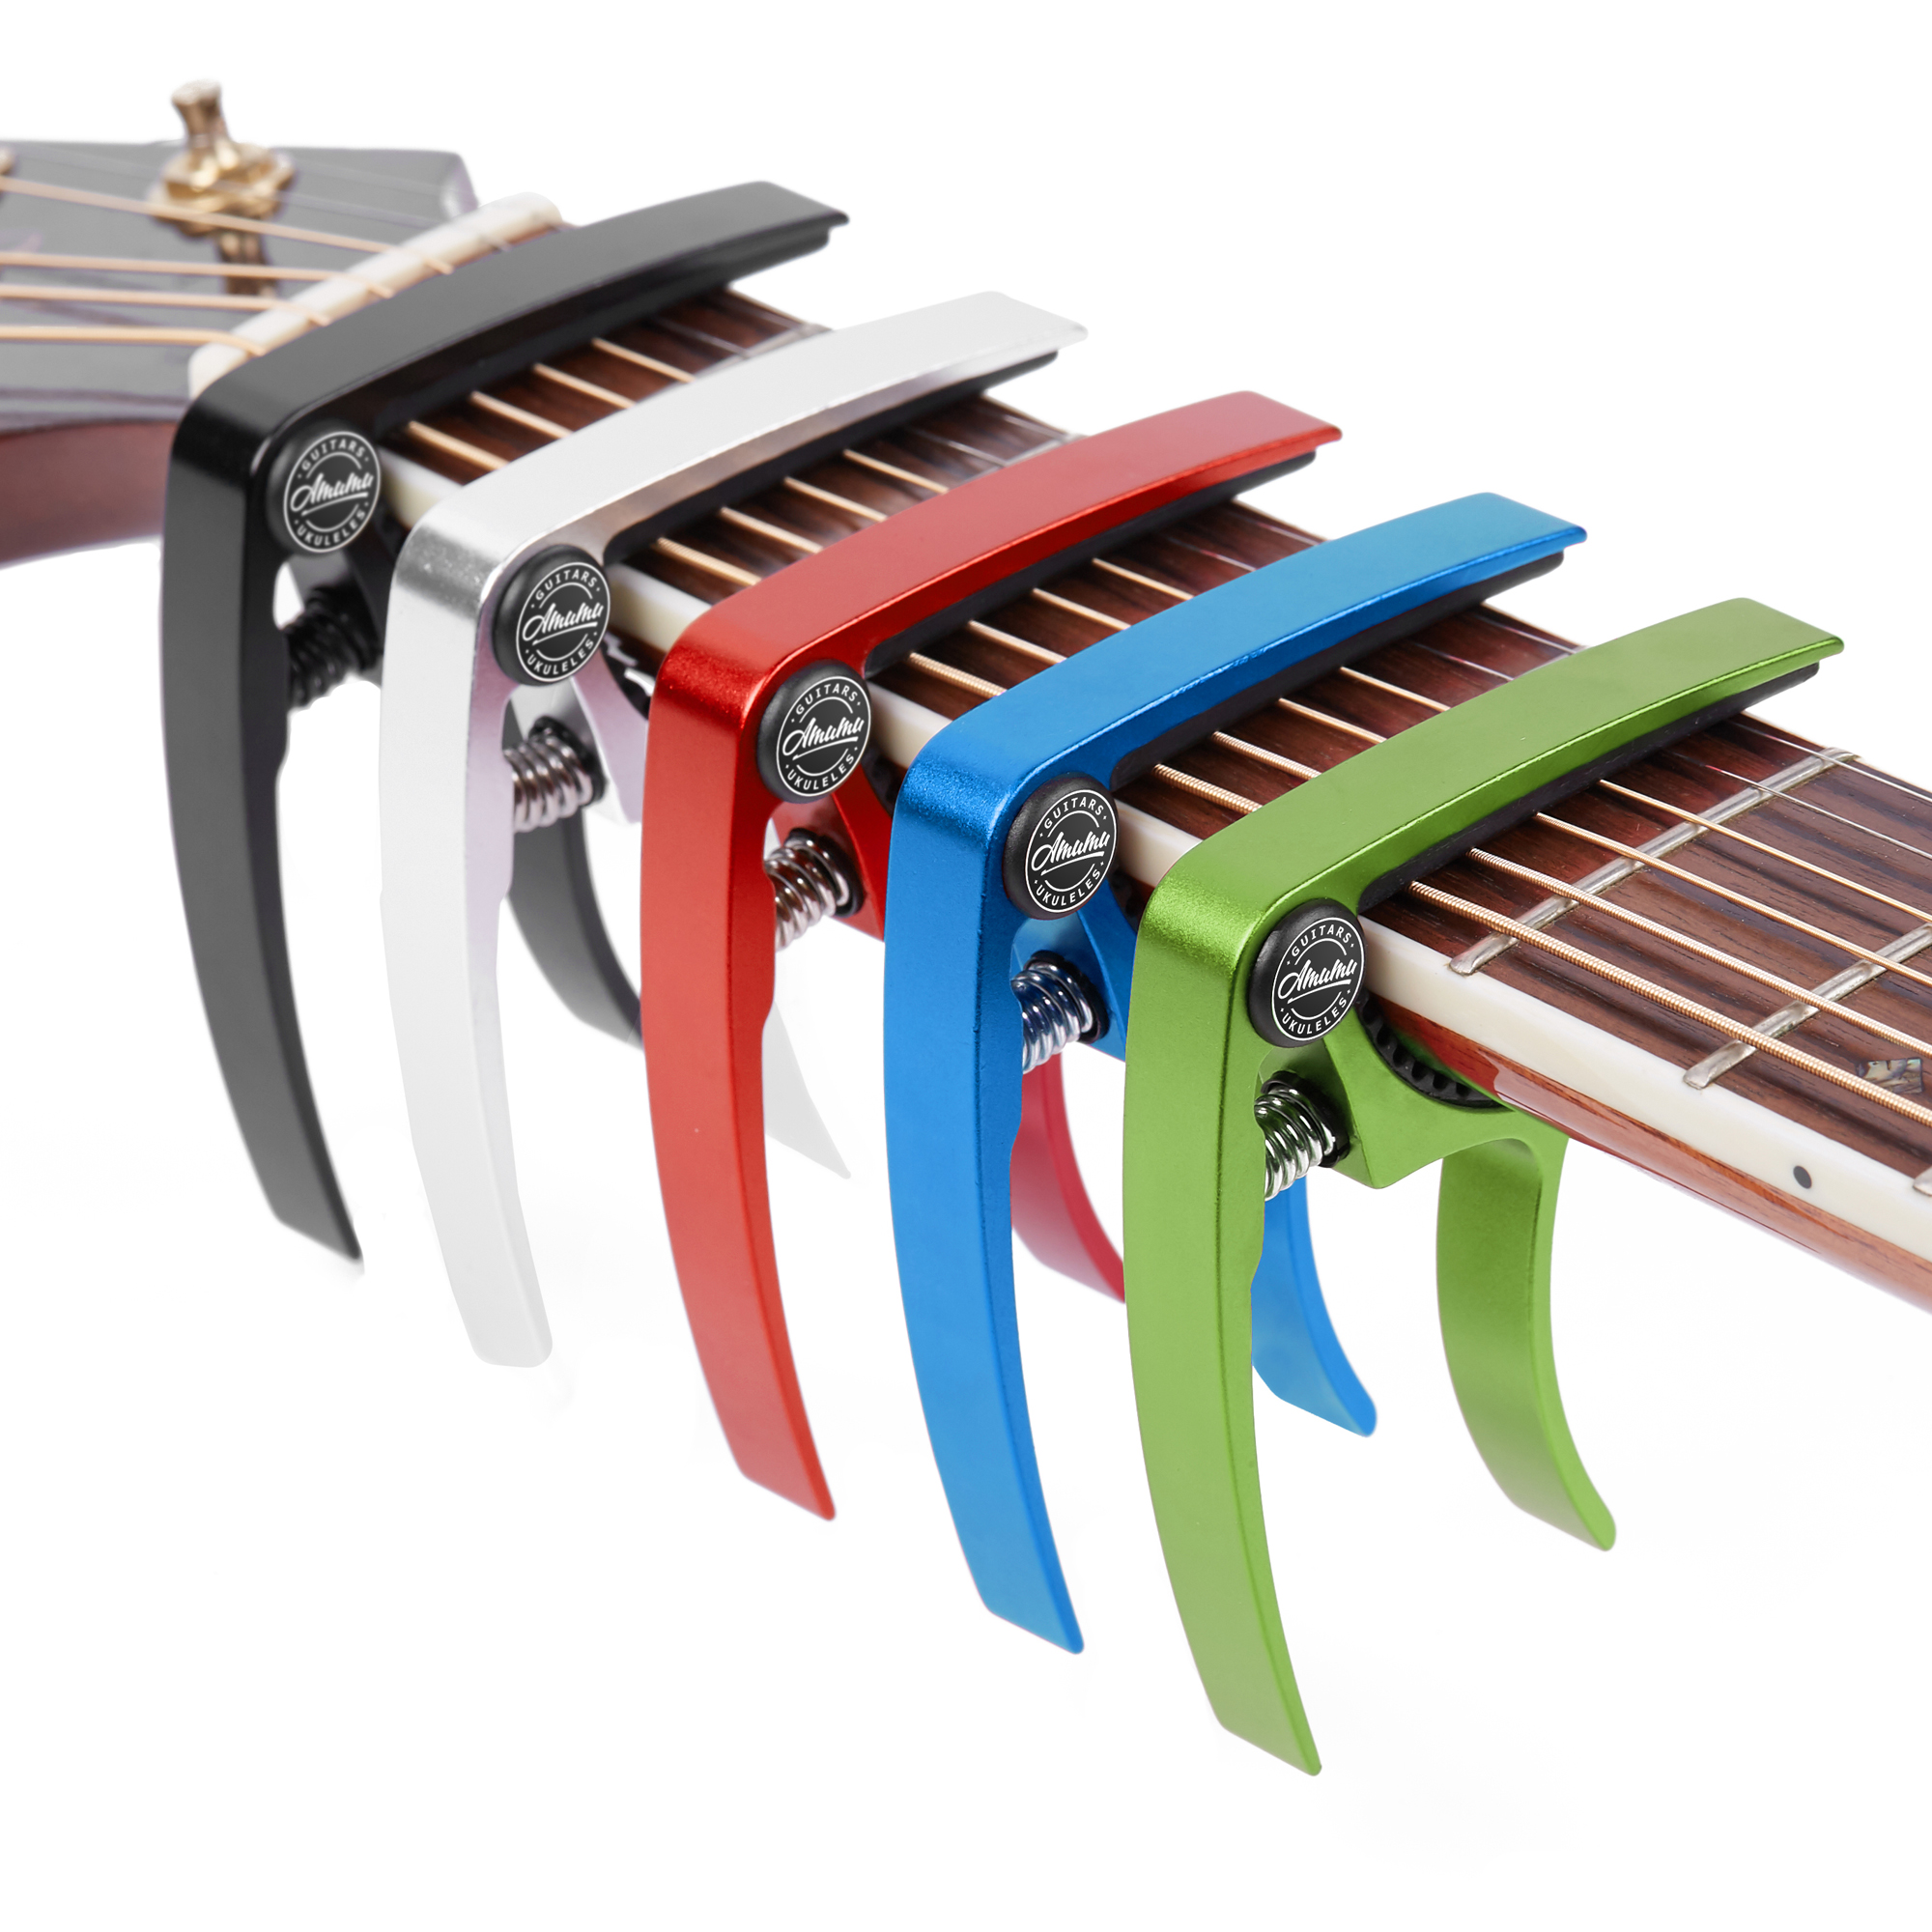 Amumu Guitare Capo pour Ukulélé Basse Banjo Mandoline Guitarra Capotraste Alliage D'aluminium FC10